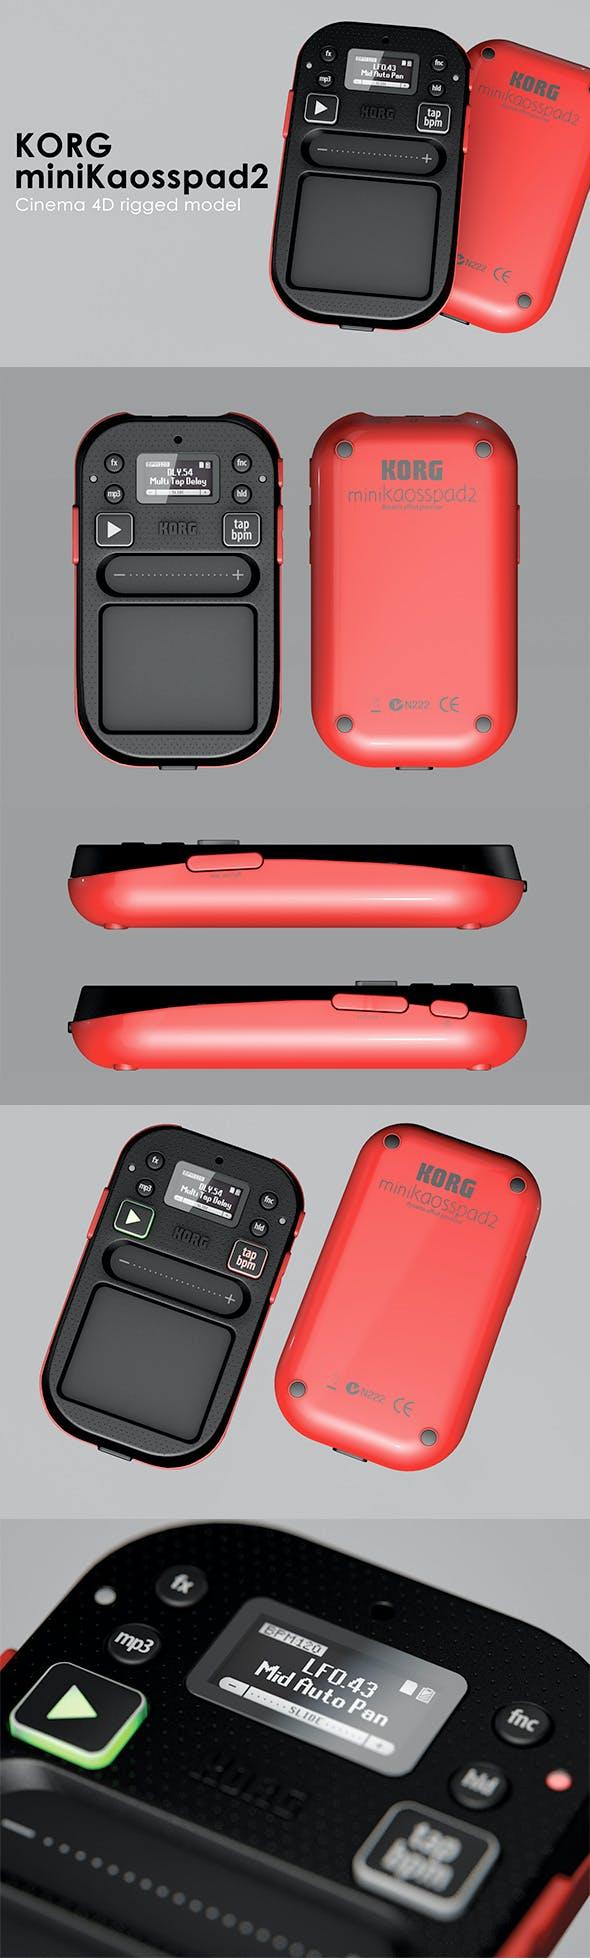 Korg miniKaosspad 2 Rigged - 3DOcean Item for Sale